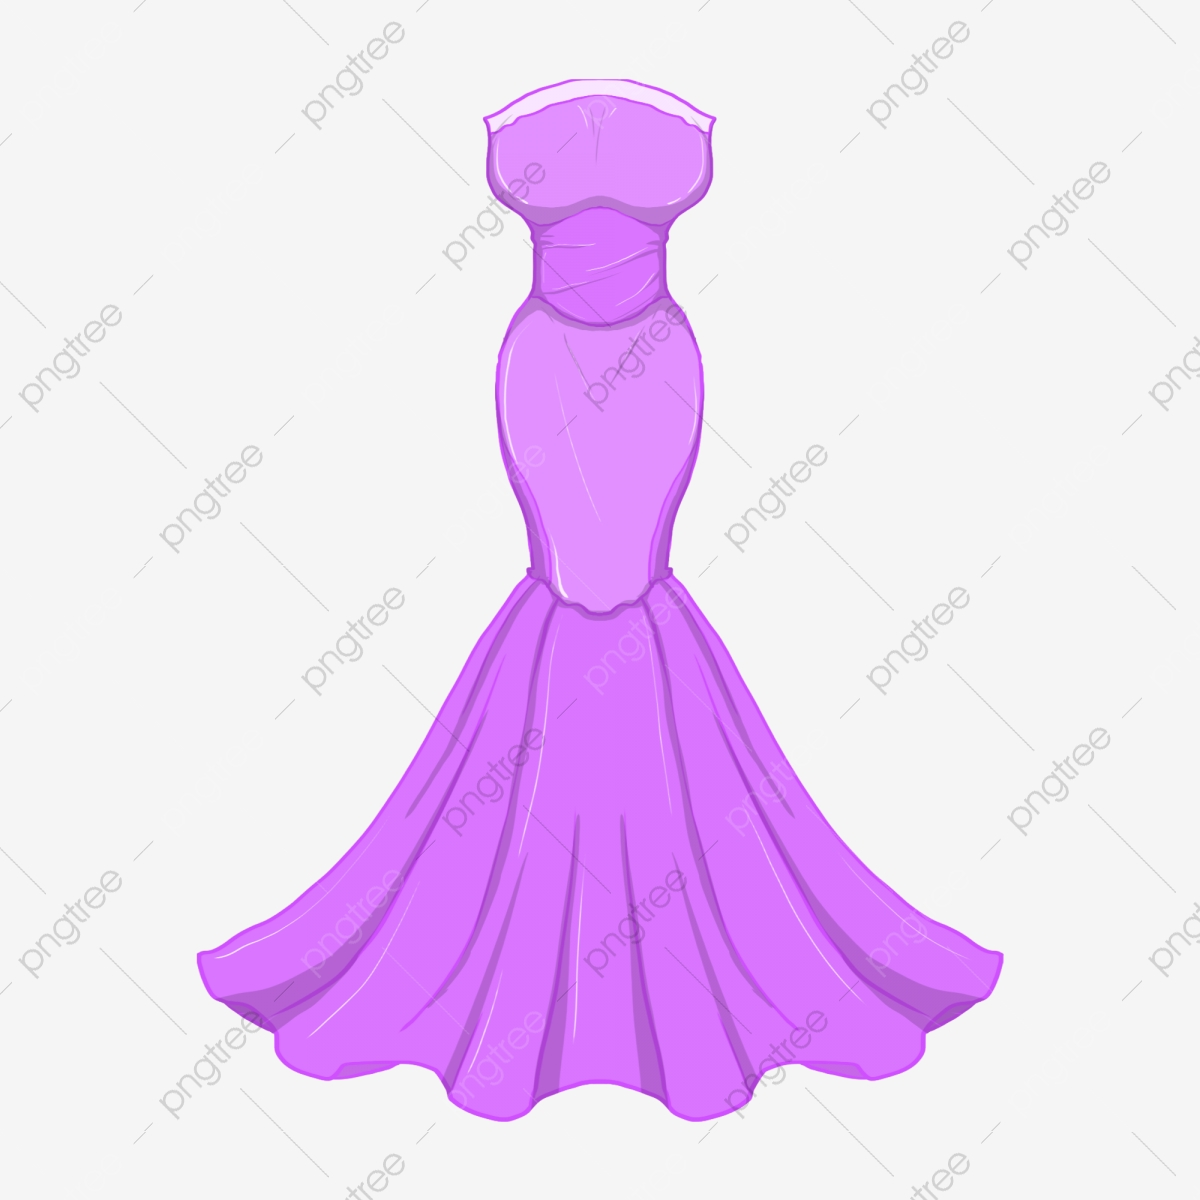 Desenhos De Vestidos De Noiva Cartoon Linda Vestido De Noiva